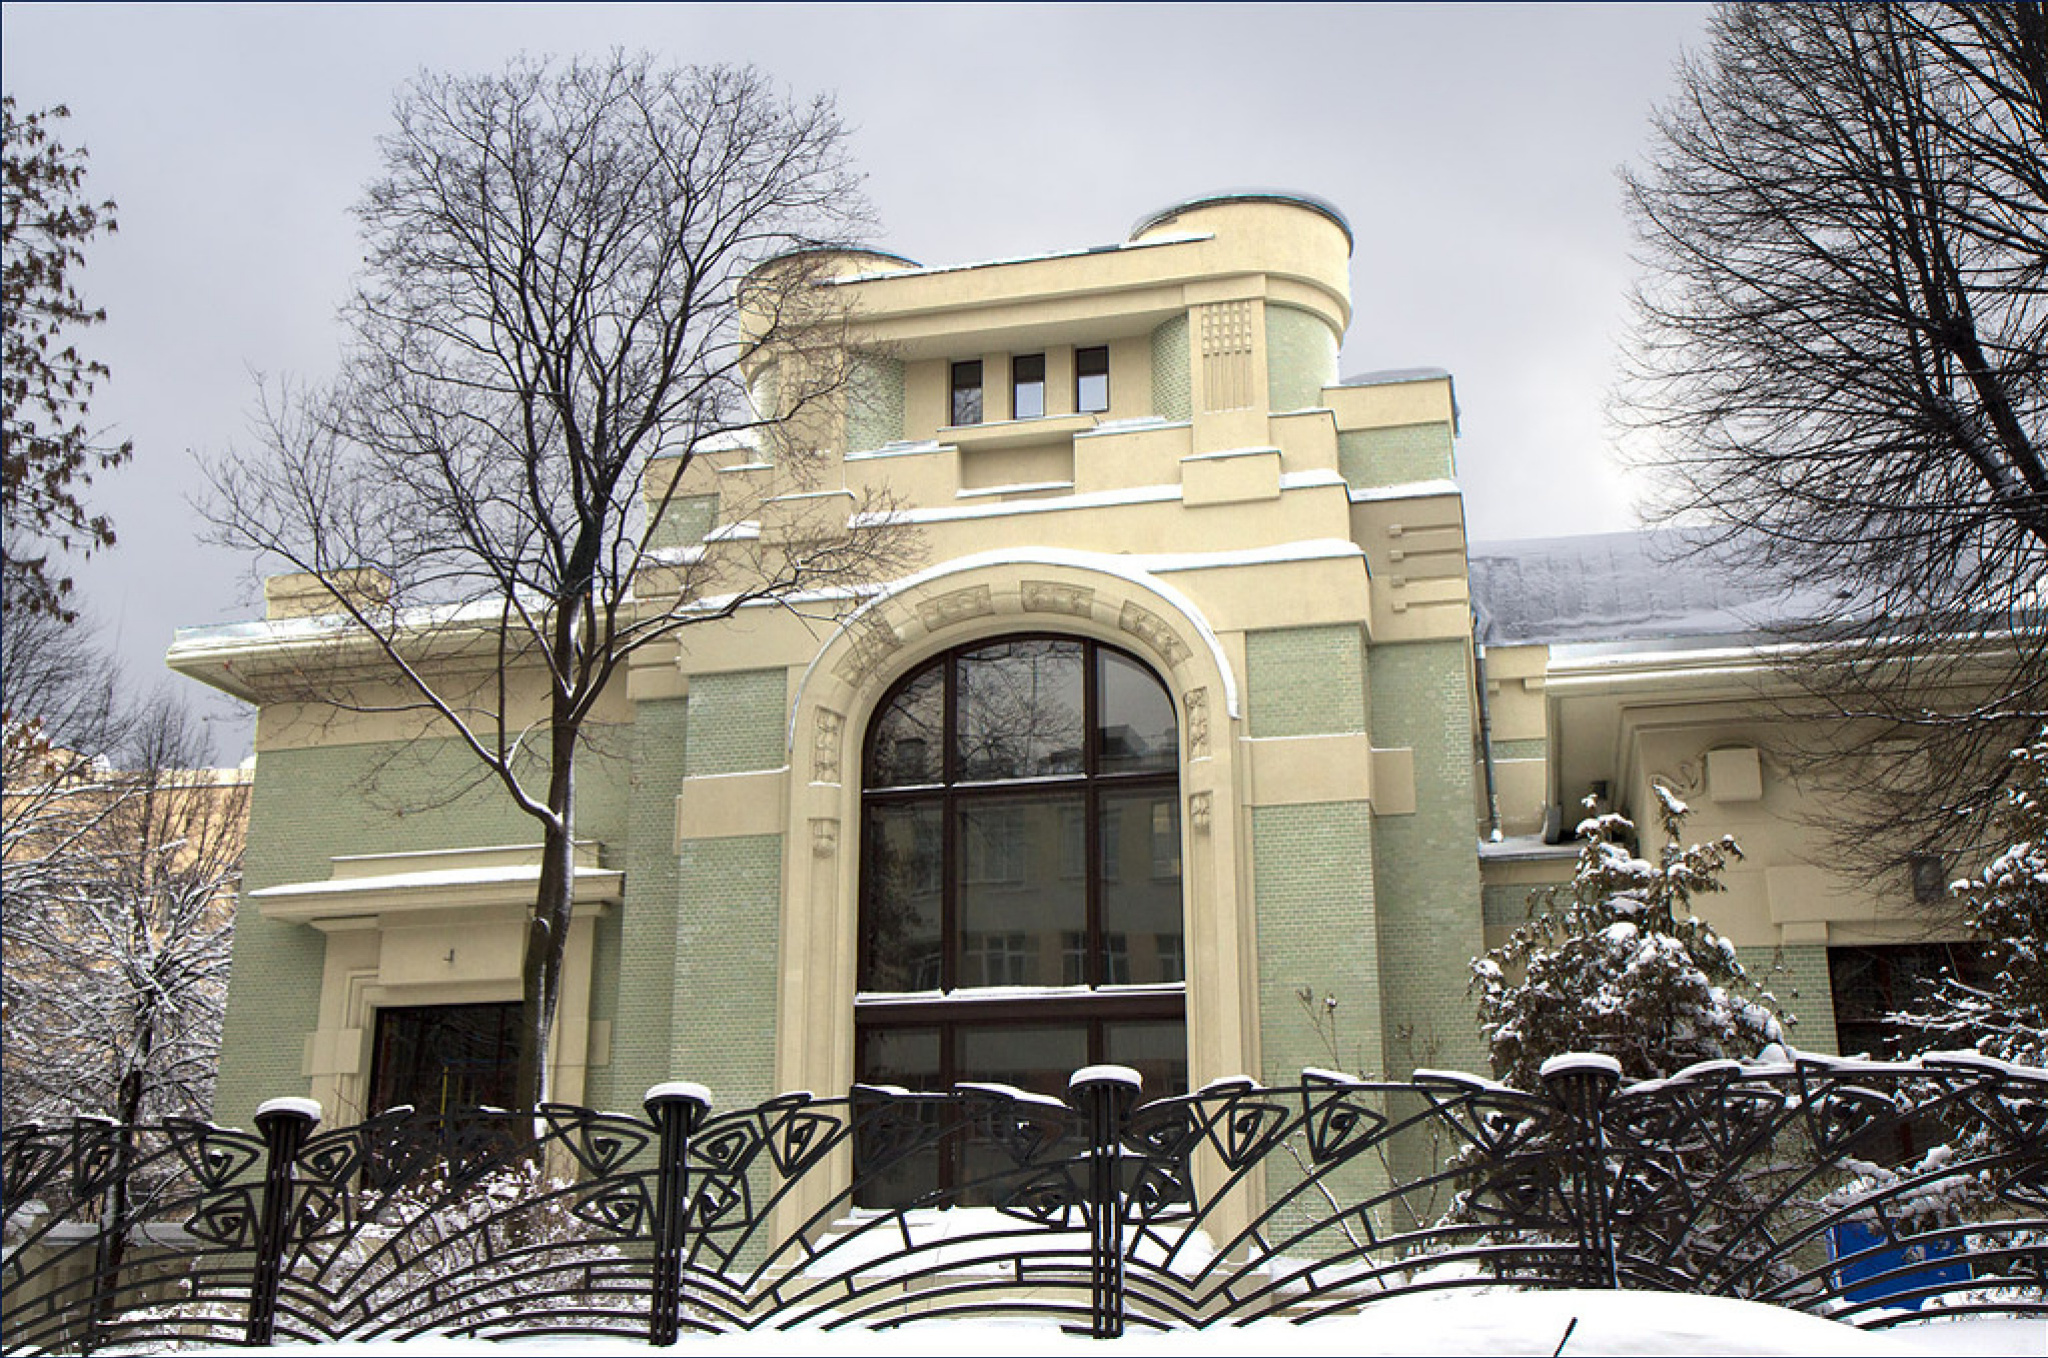 Mansion of A. I. Derozhinskaya. Built in 1901-1904. Designed by architect Fyodor Shekhtel for Alexan